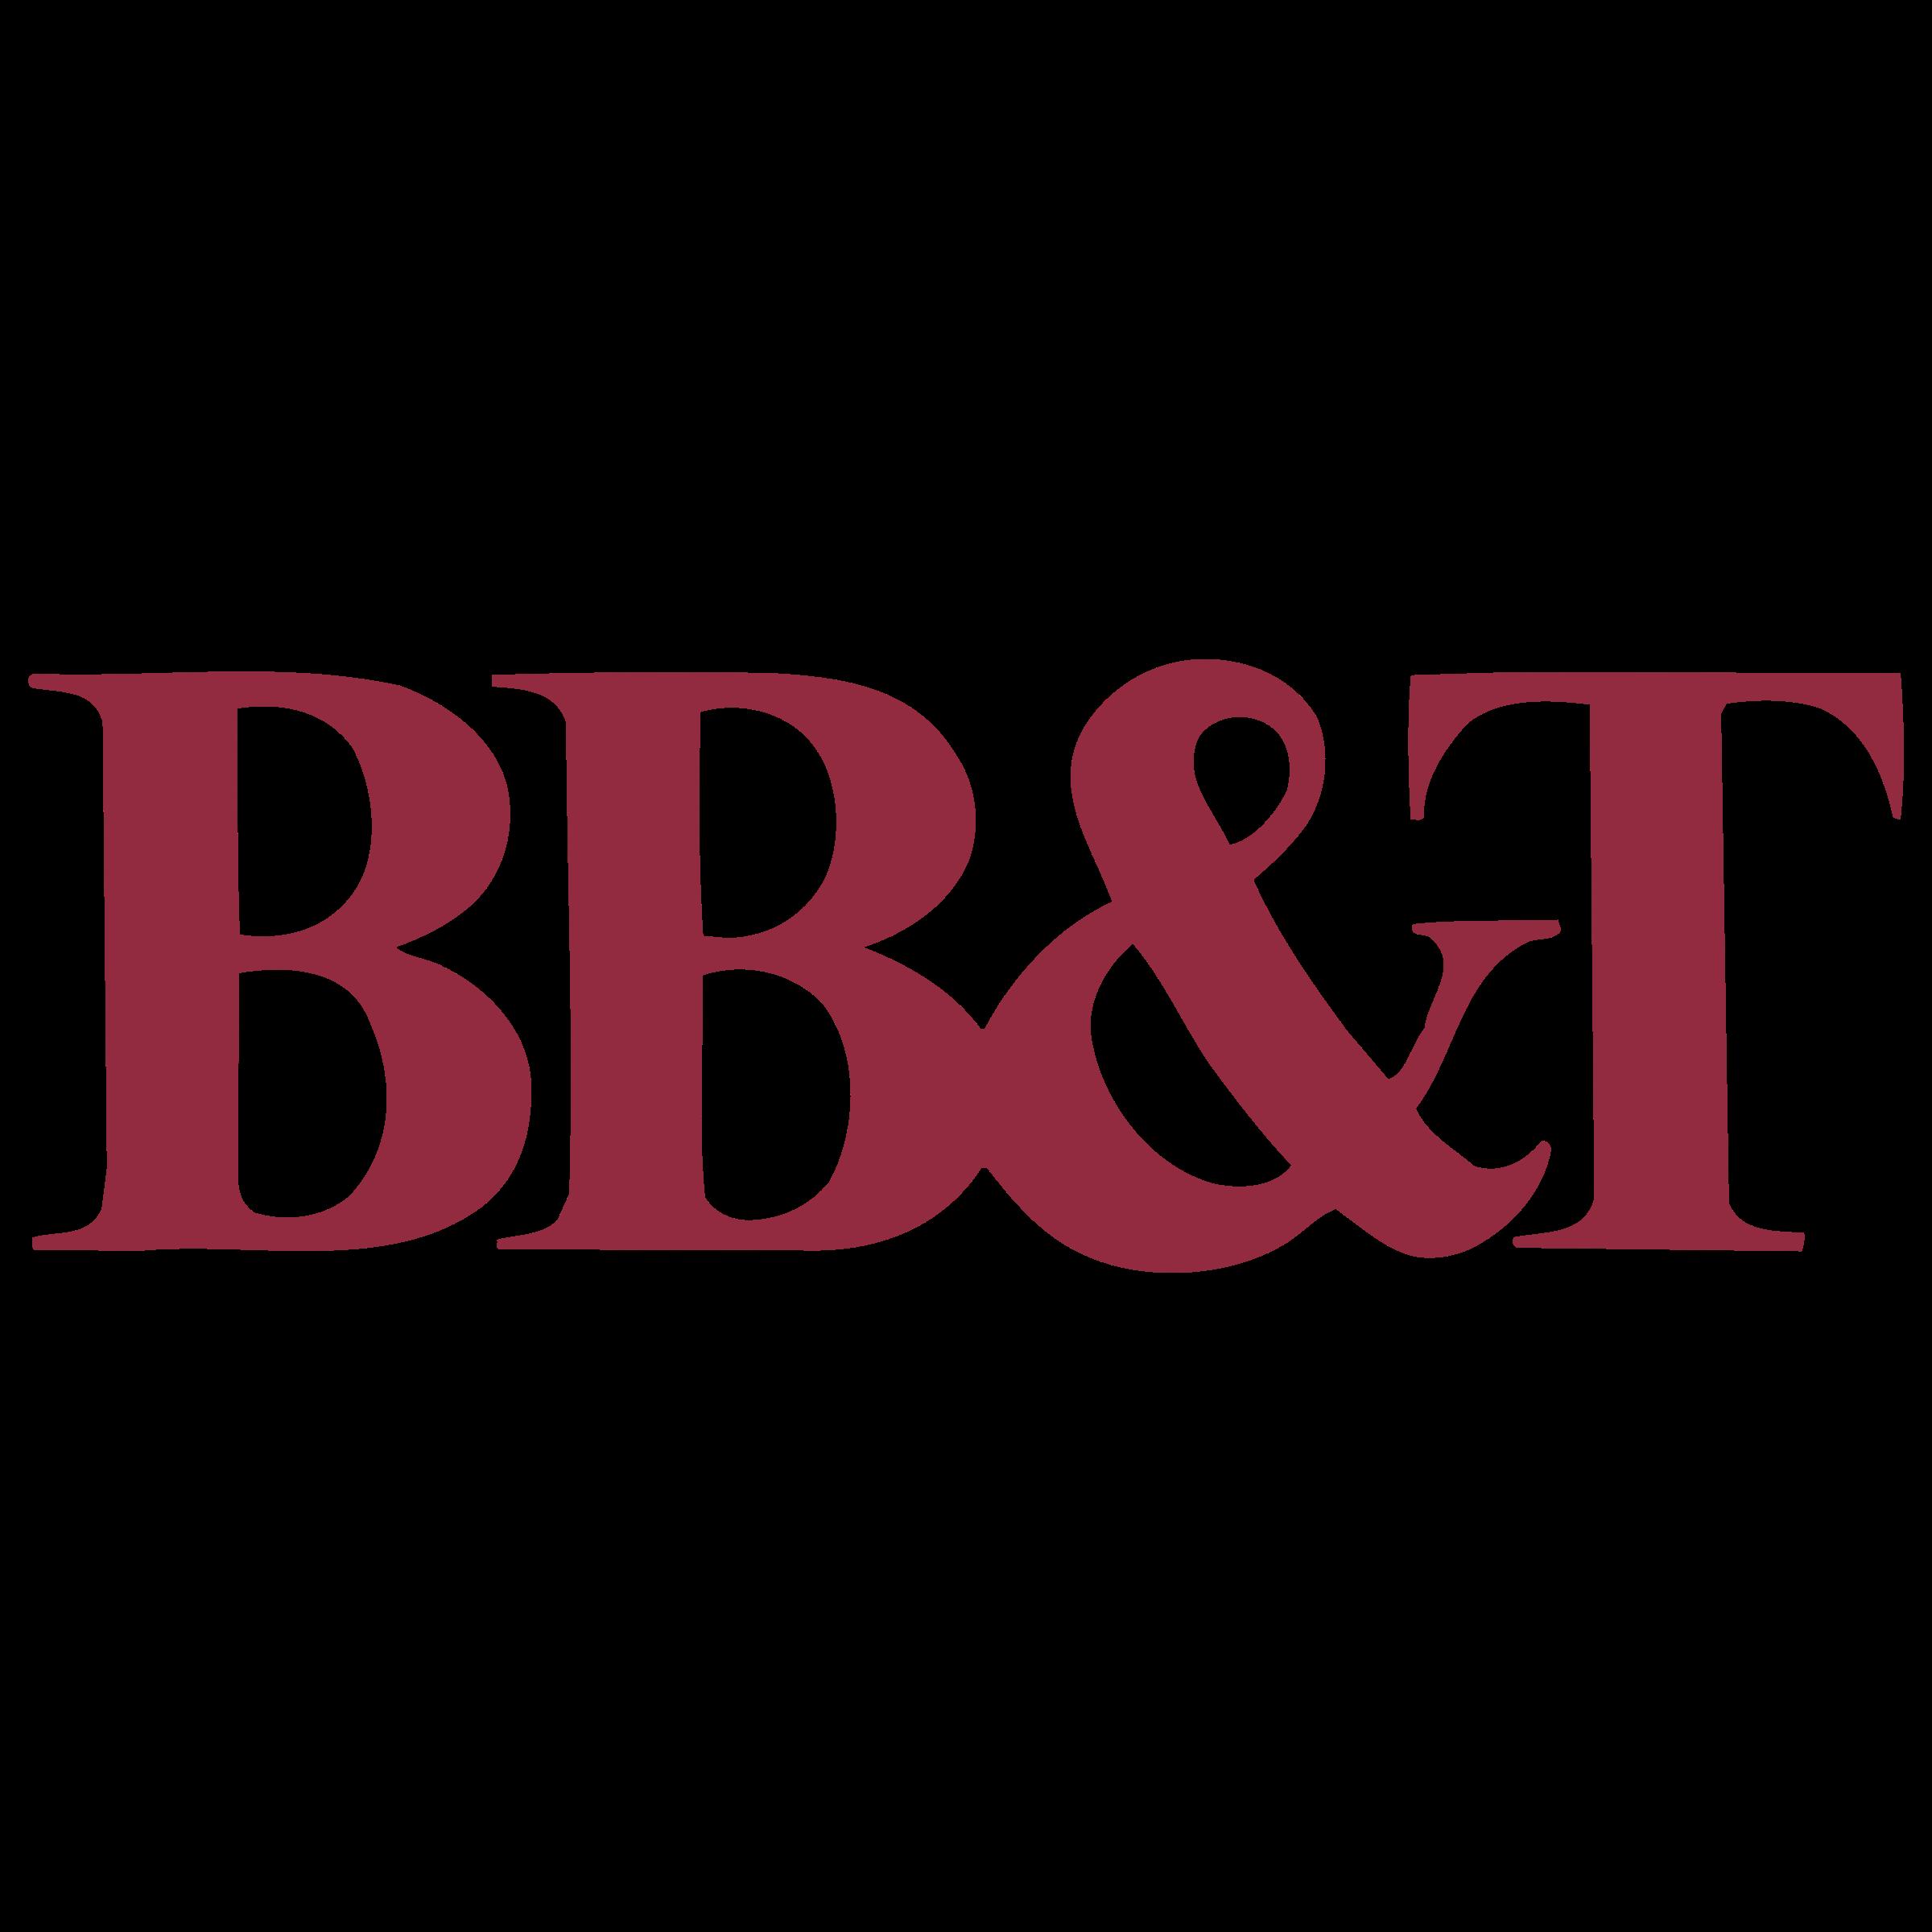 bb t logo png transparent